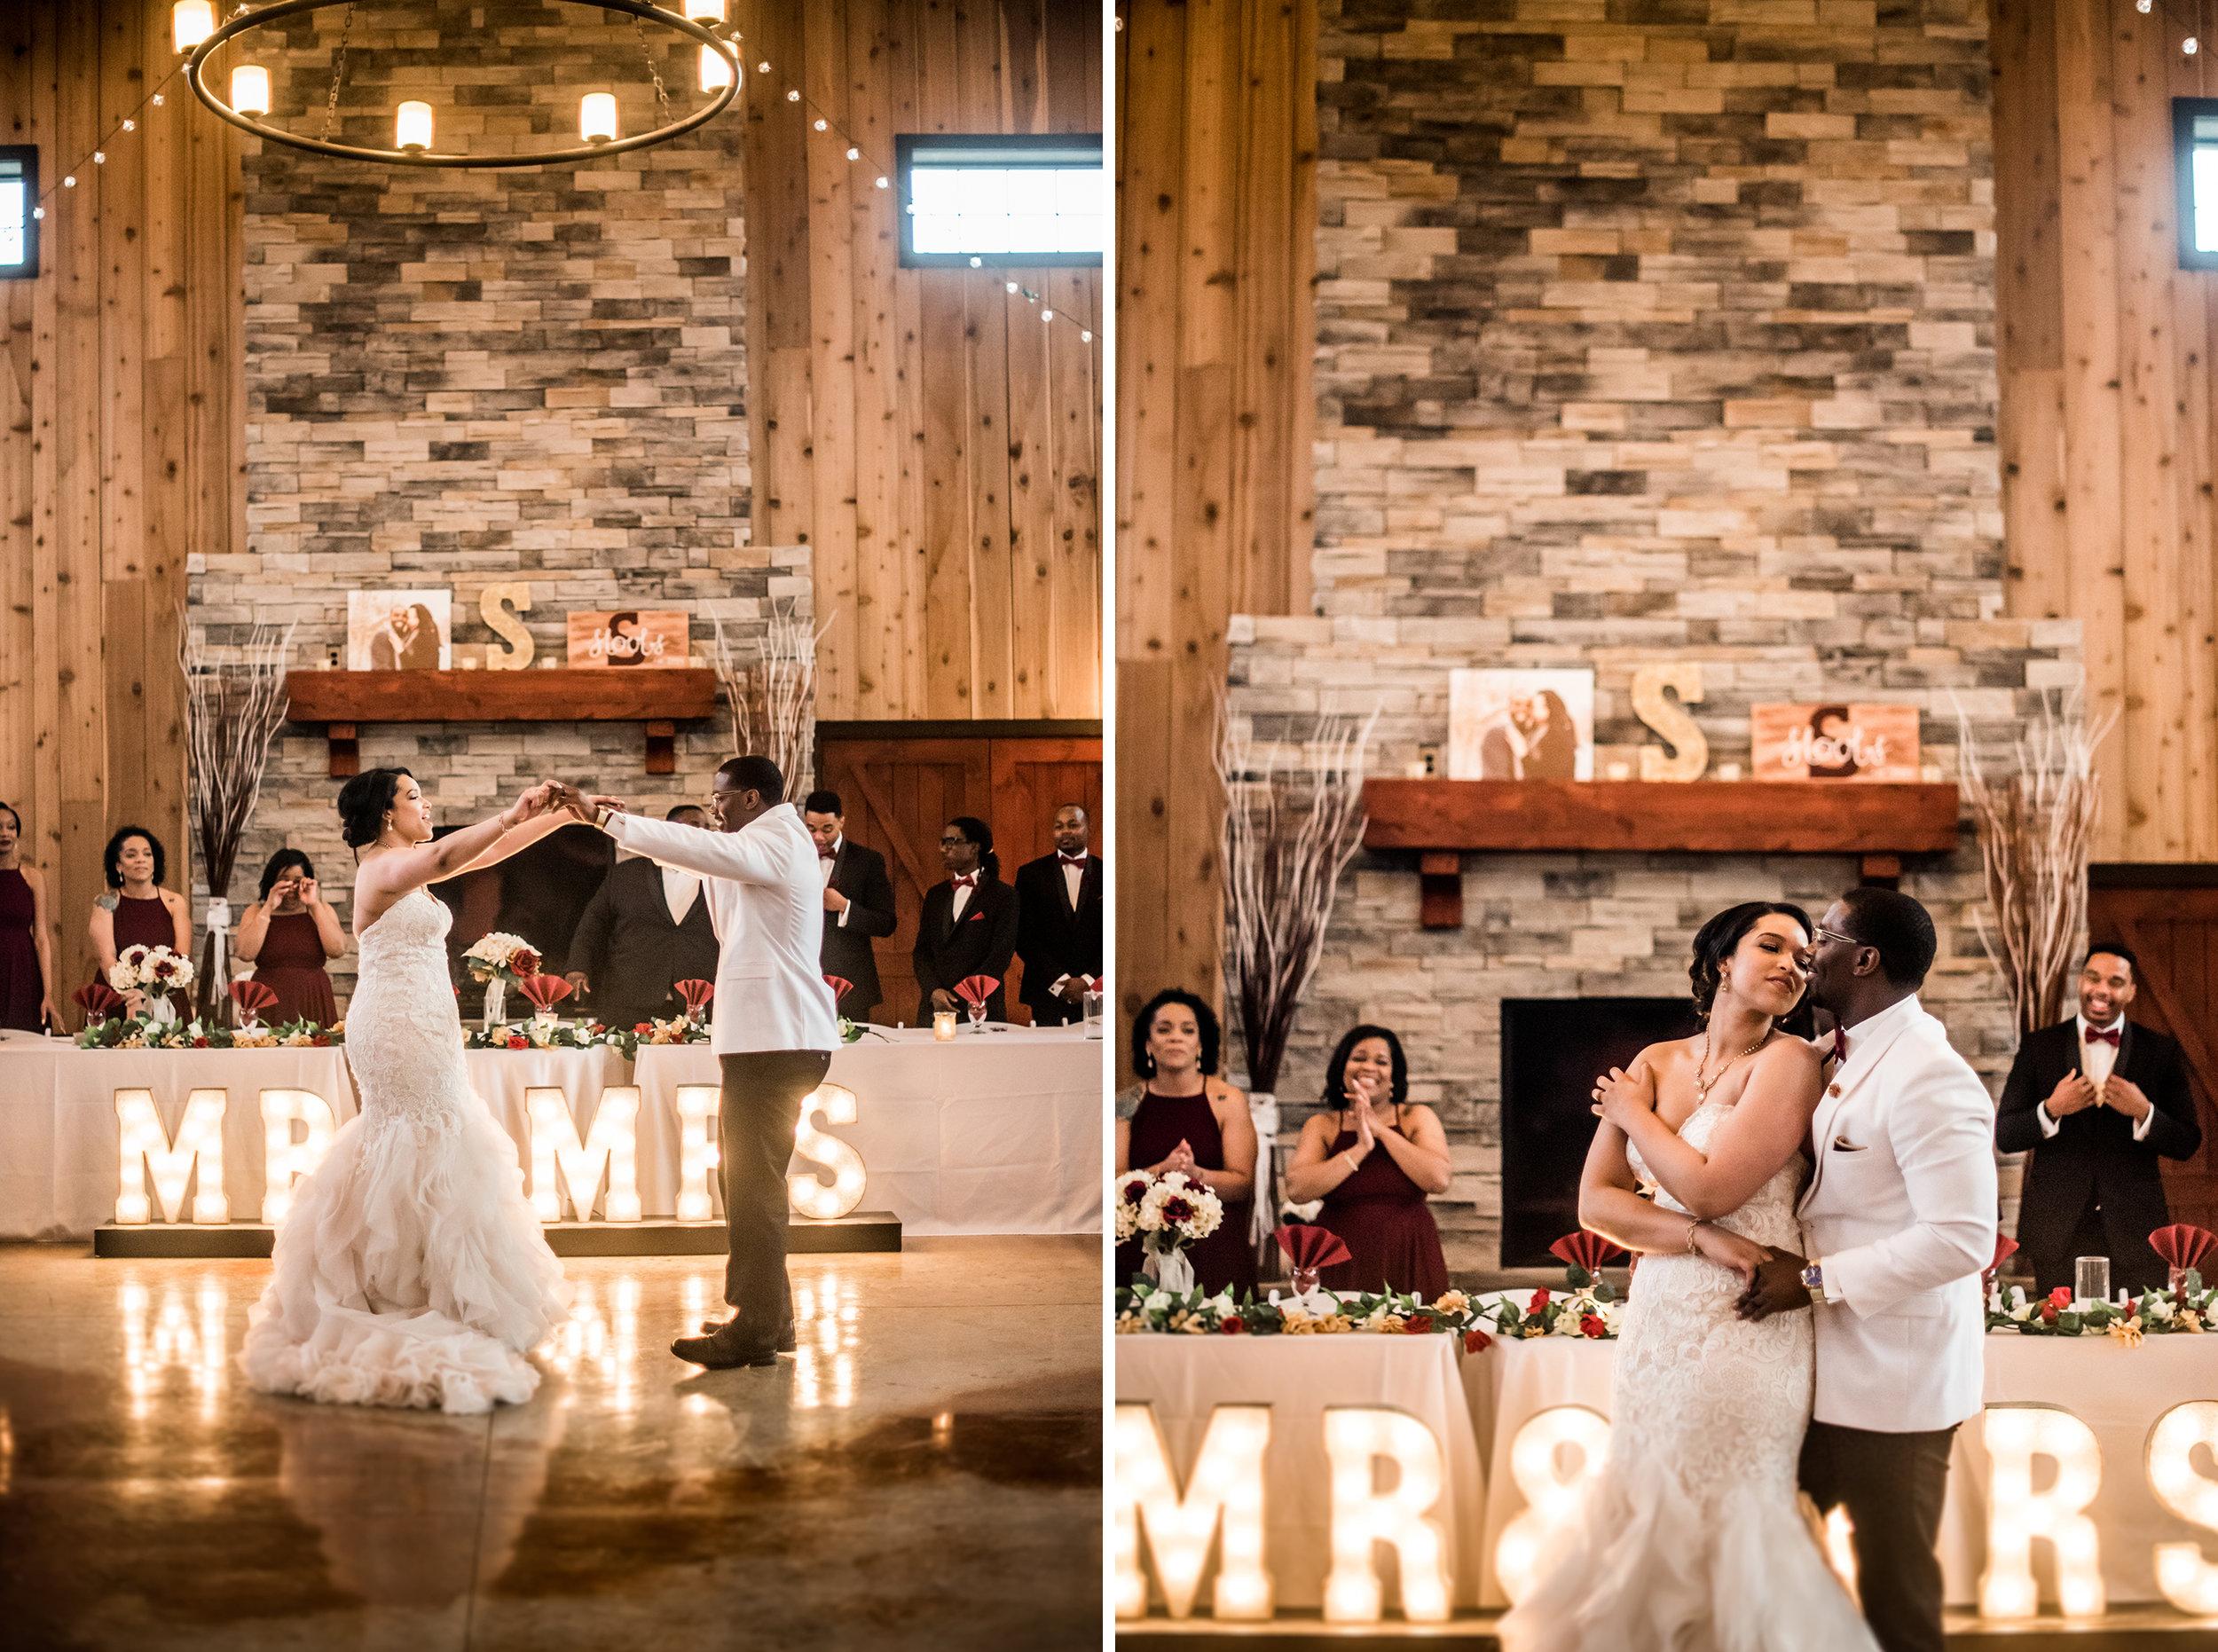 Burlington Iowa Wedding Midwest Photographer Melissa Cervantes _ Chantelle and Isaiah 1171.jpg